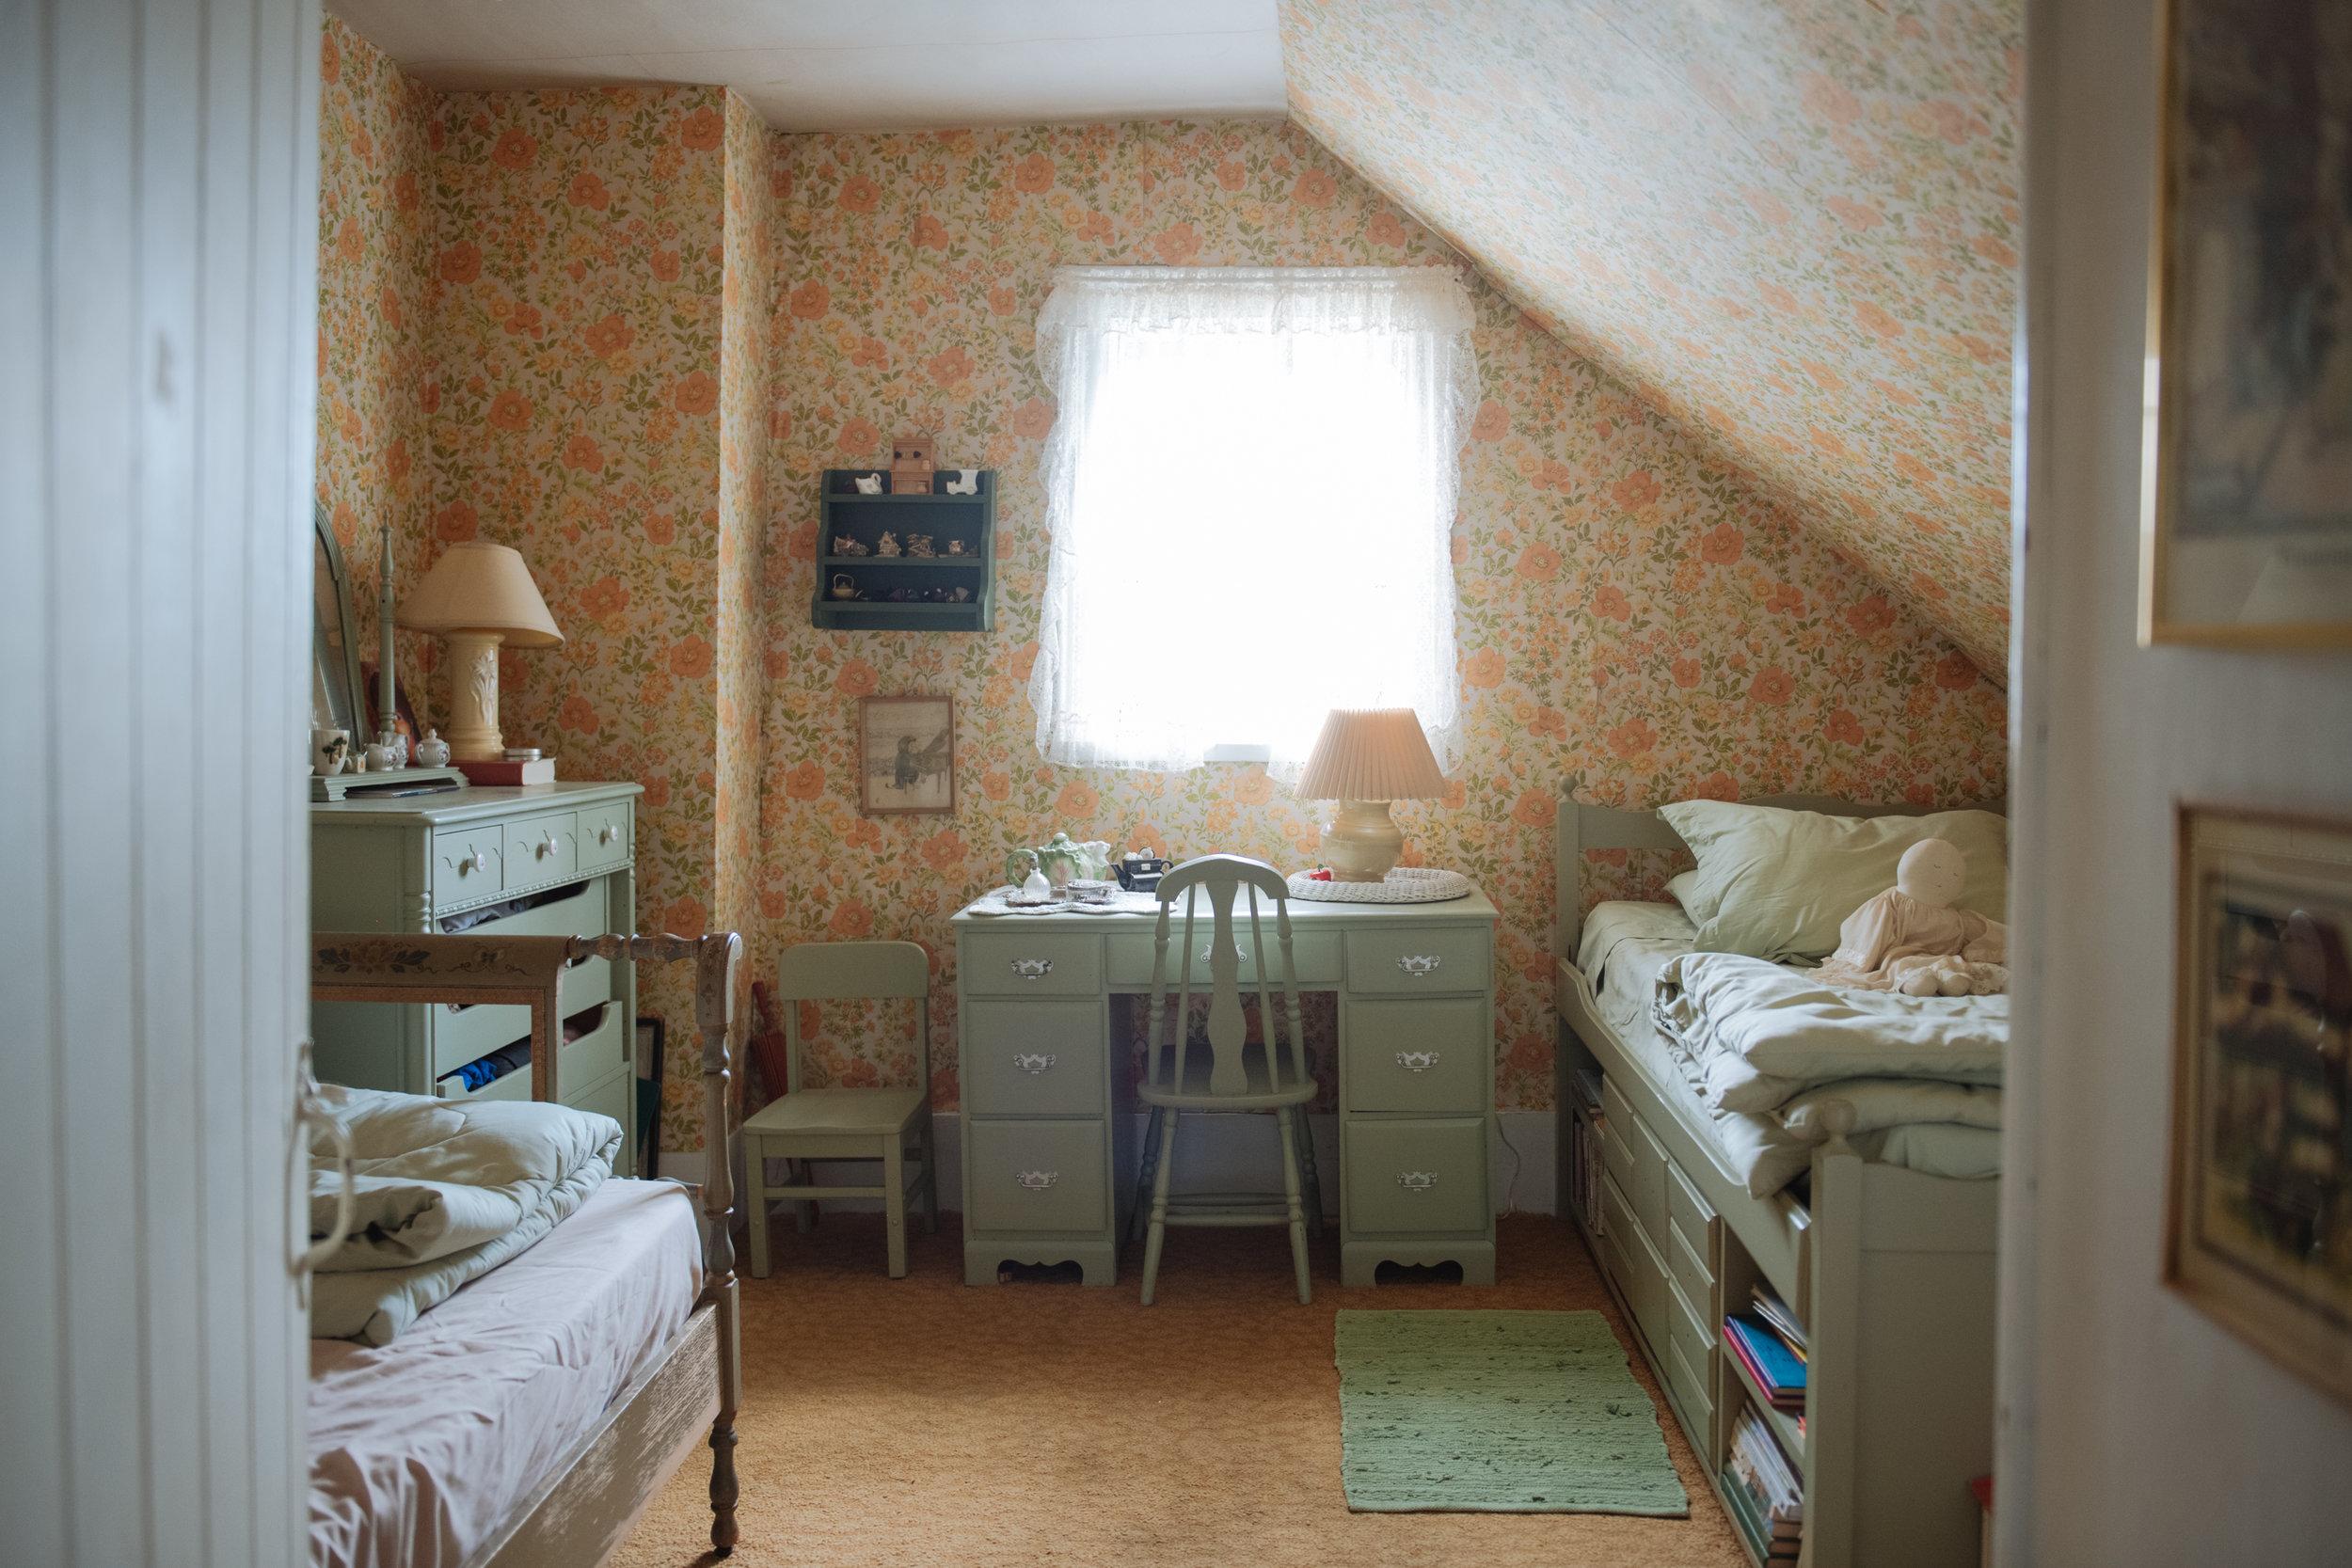 Rodan-Farmhouse-070719-260.jpg